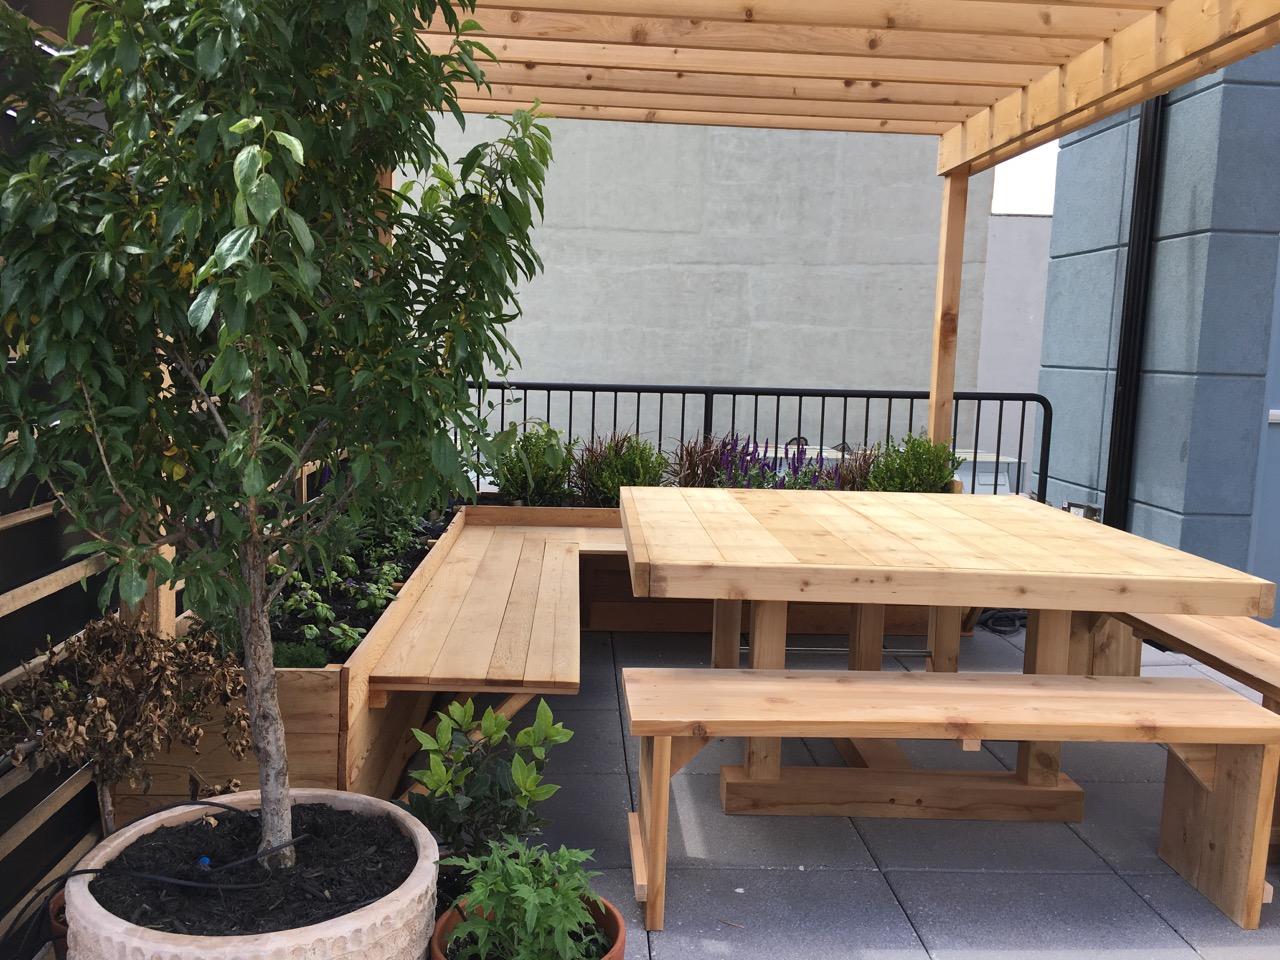 arbor-custom-edibles-rooftop-terrace-garden-by-edible-petals-brooklyn4.jpg